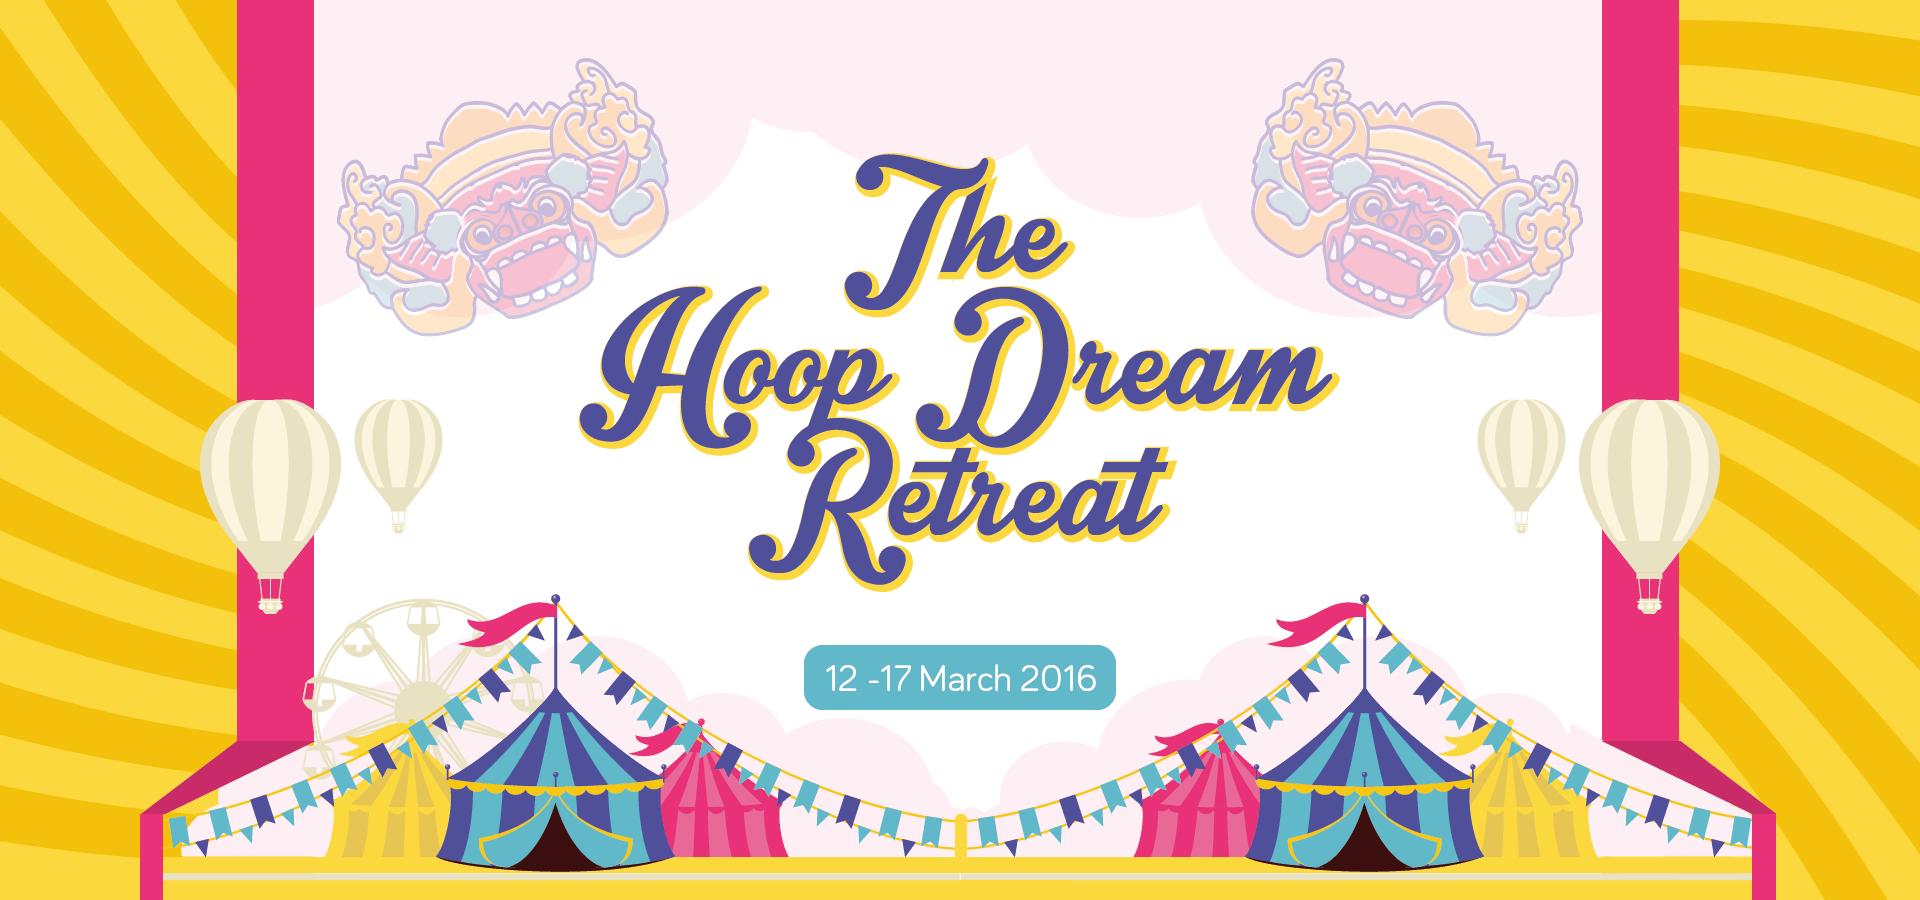 The Hoop Dream Retreat 2016